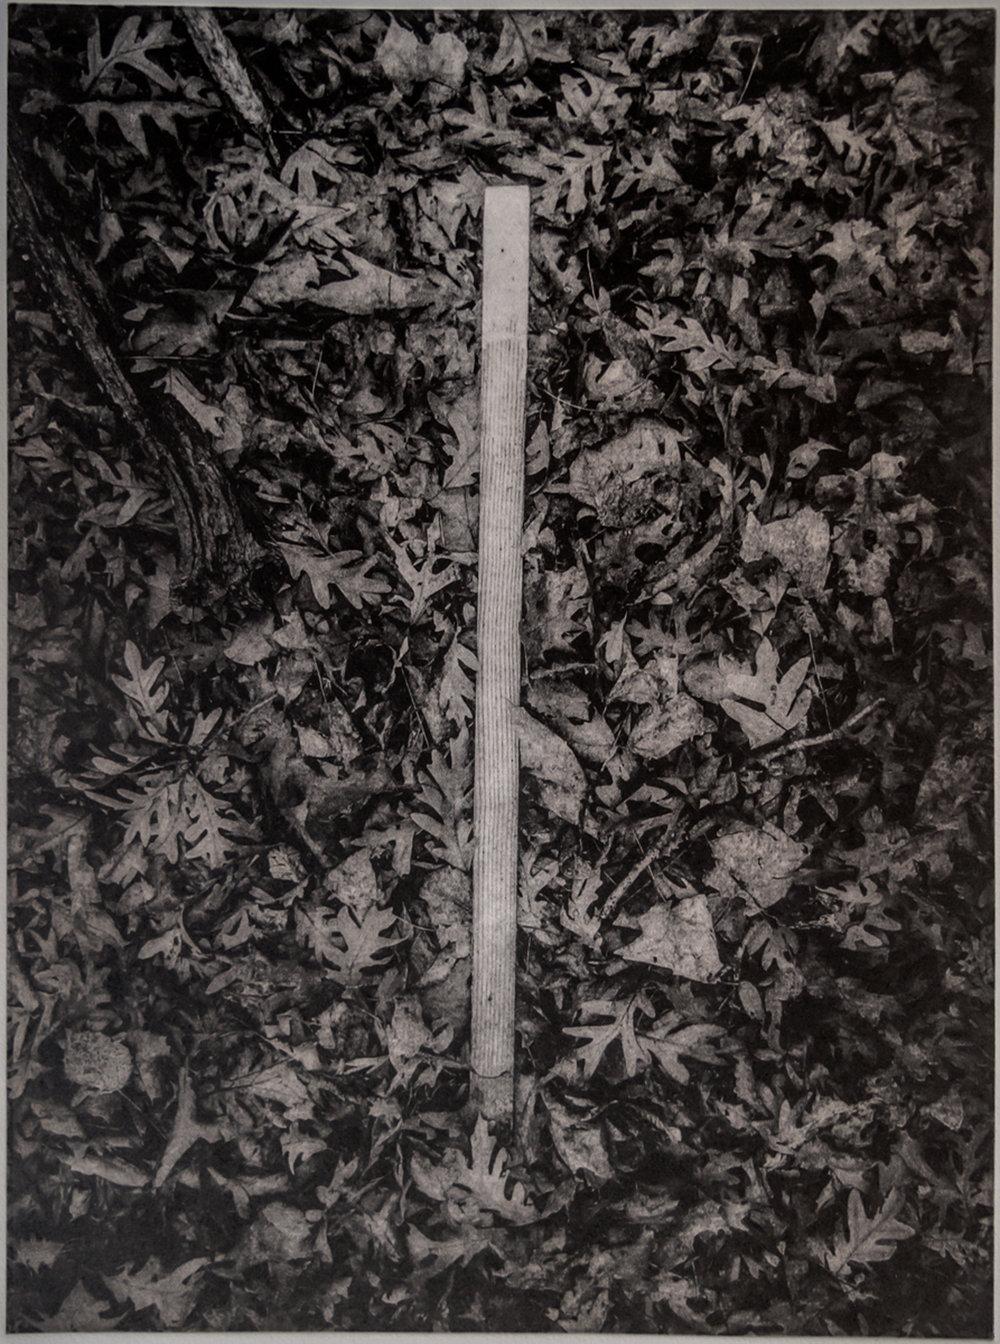 John Pearson, Path Marker, polymergravure